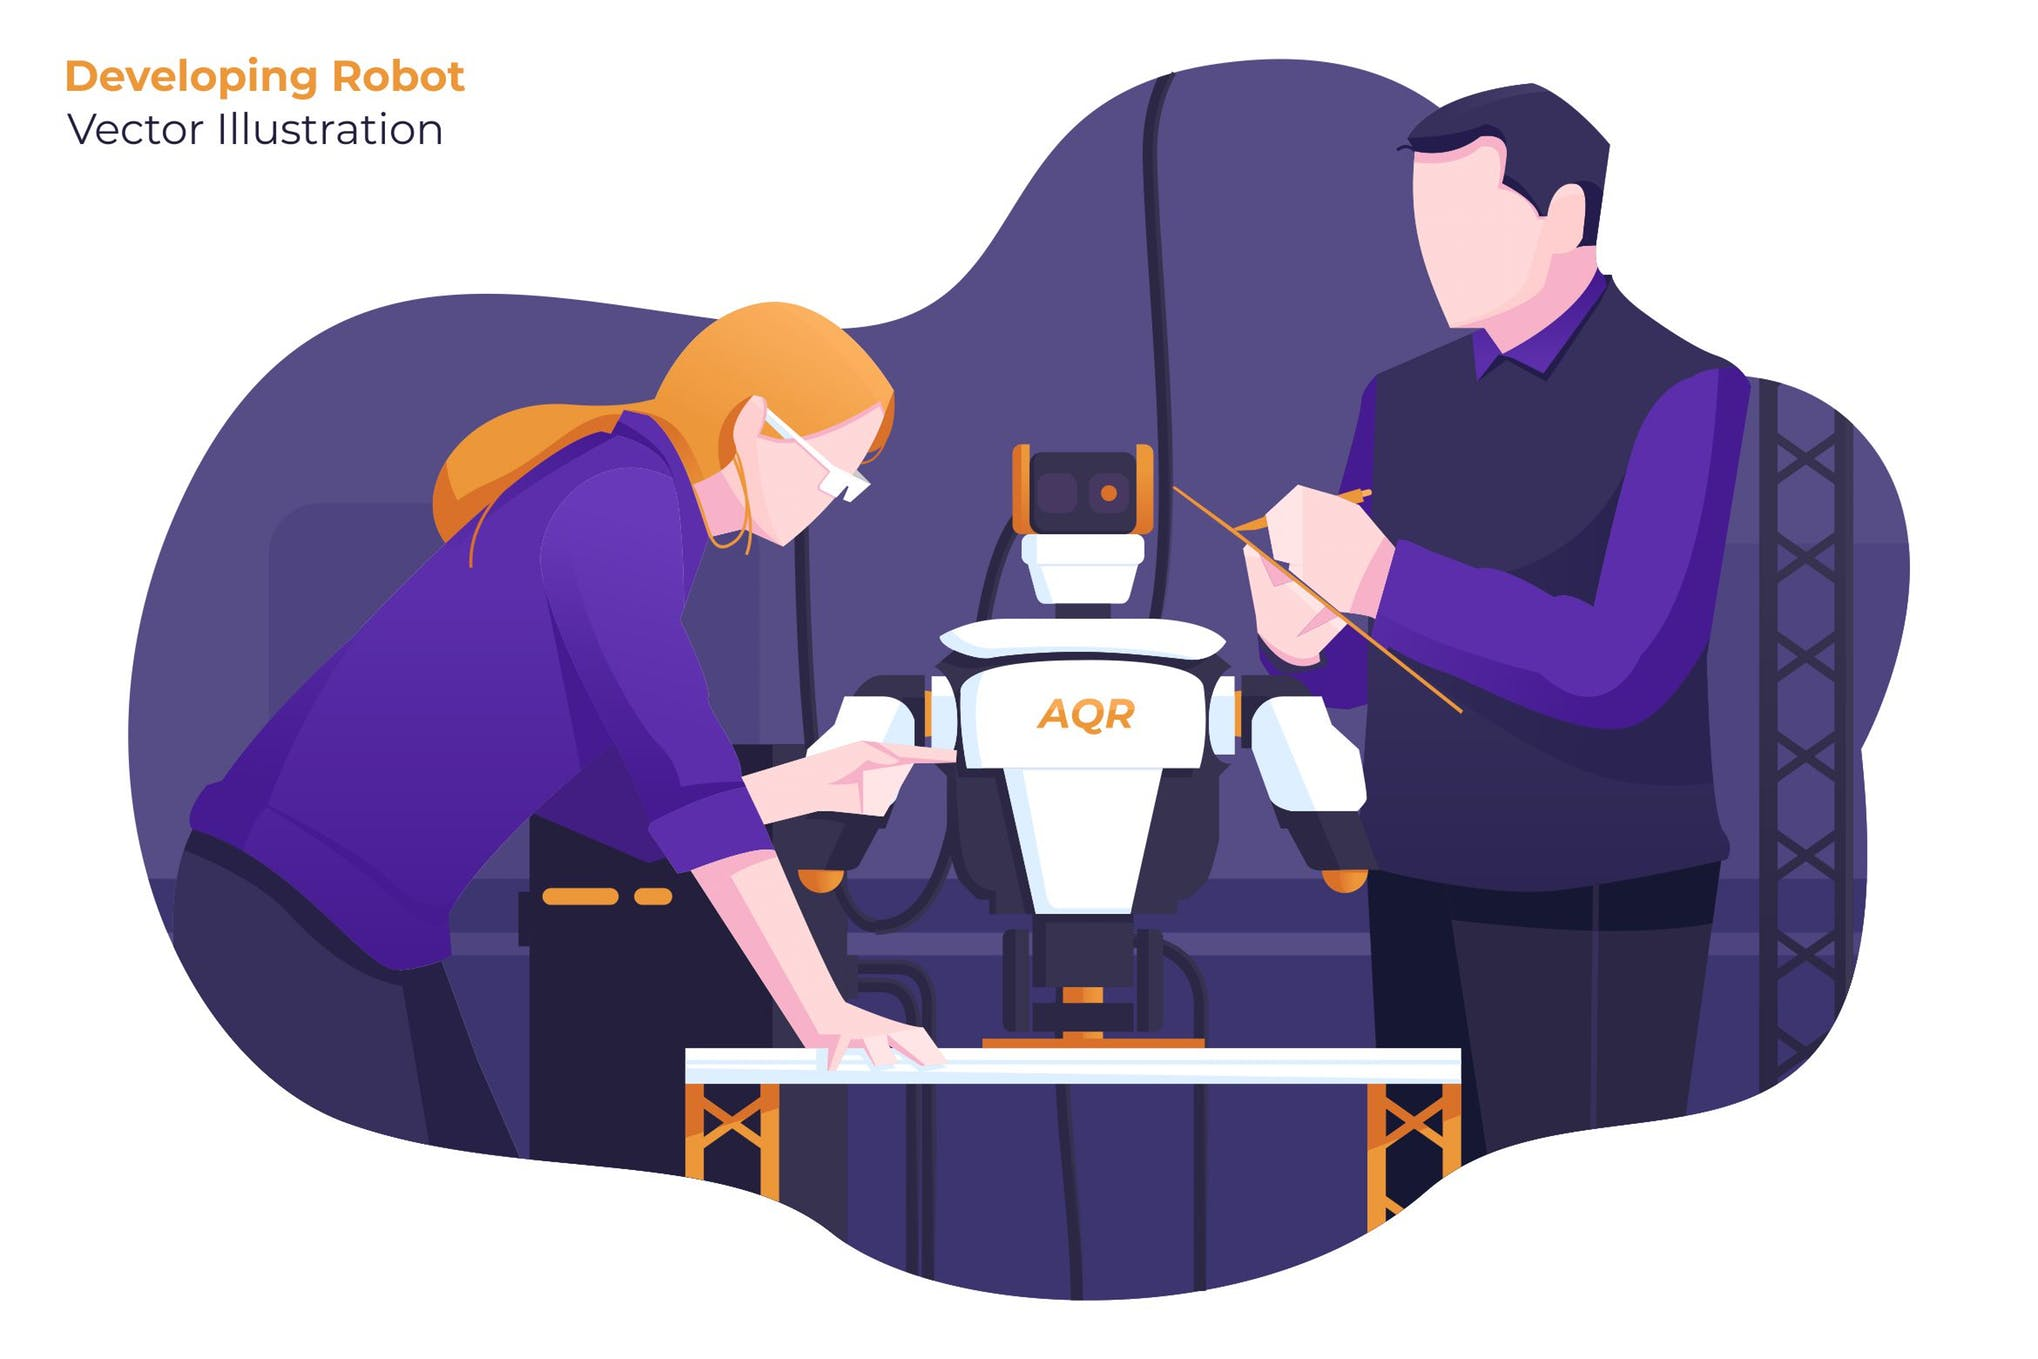 开发机器人创意场景插画素材模板下载Developing Robot - Vector Illustration